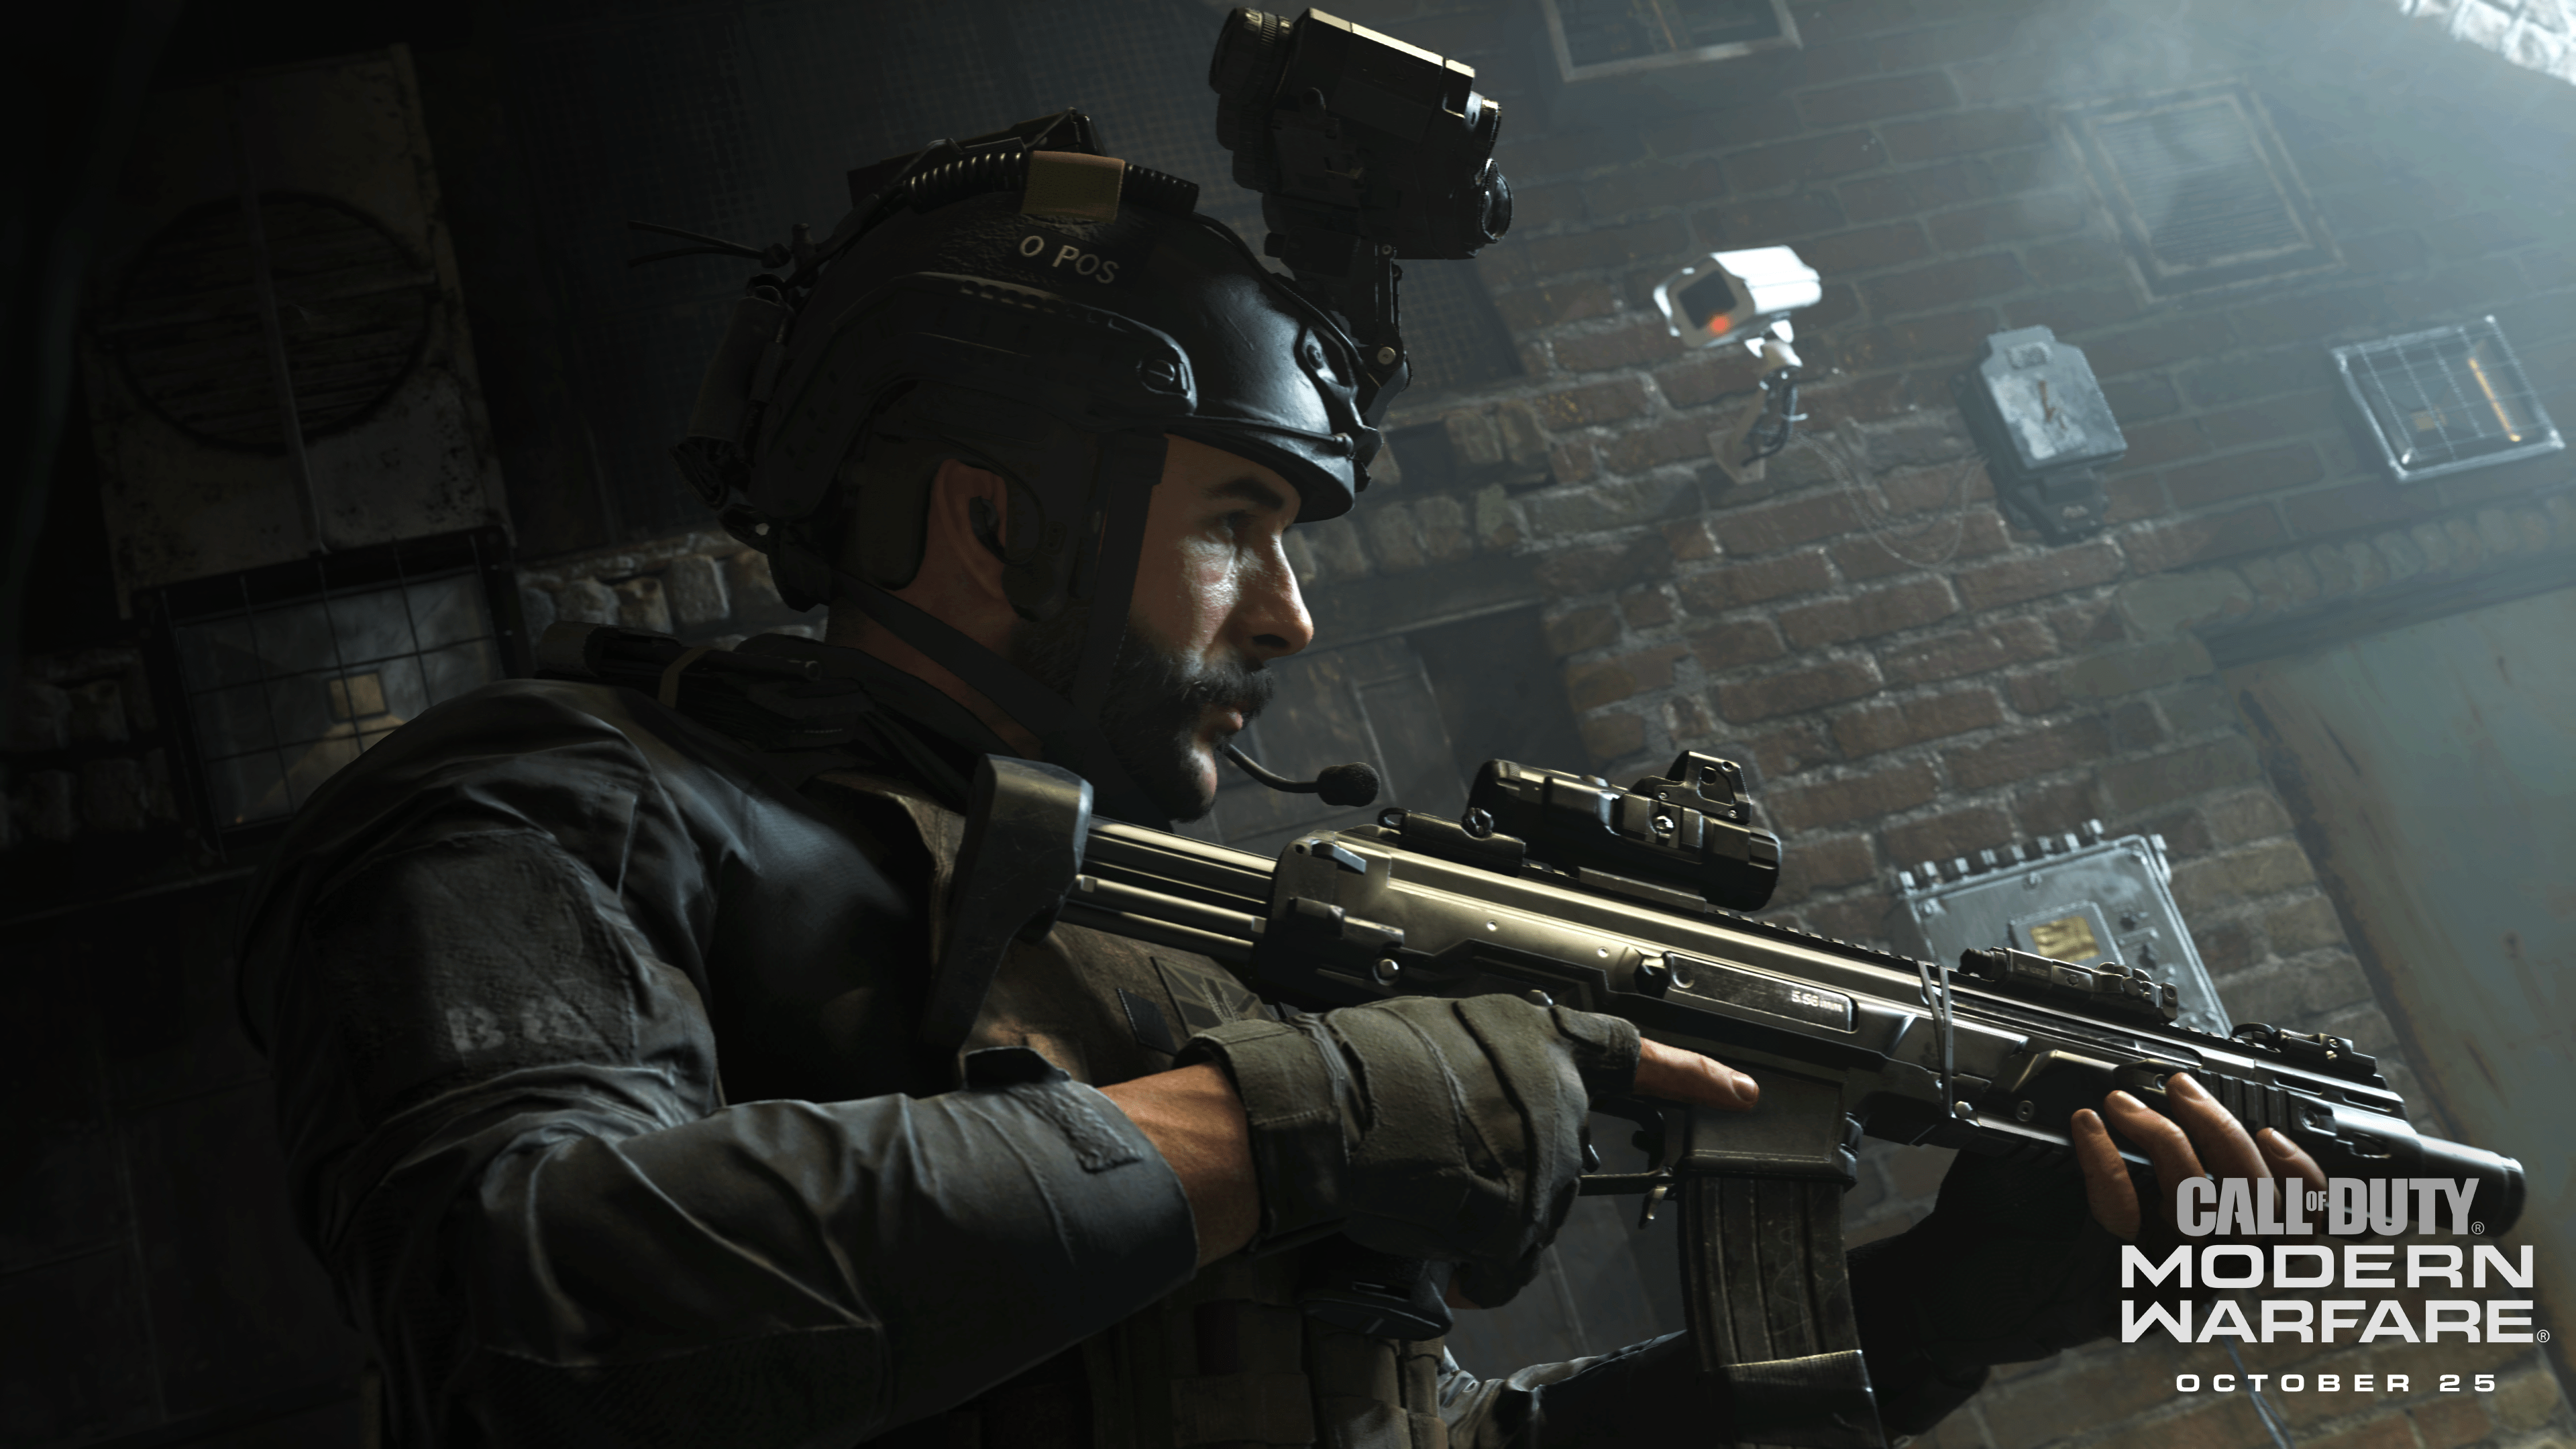 Gamers Claim 'COD: Modern Warfare' Is Bricking Xbox One Consoles